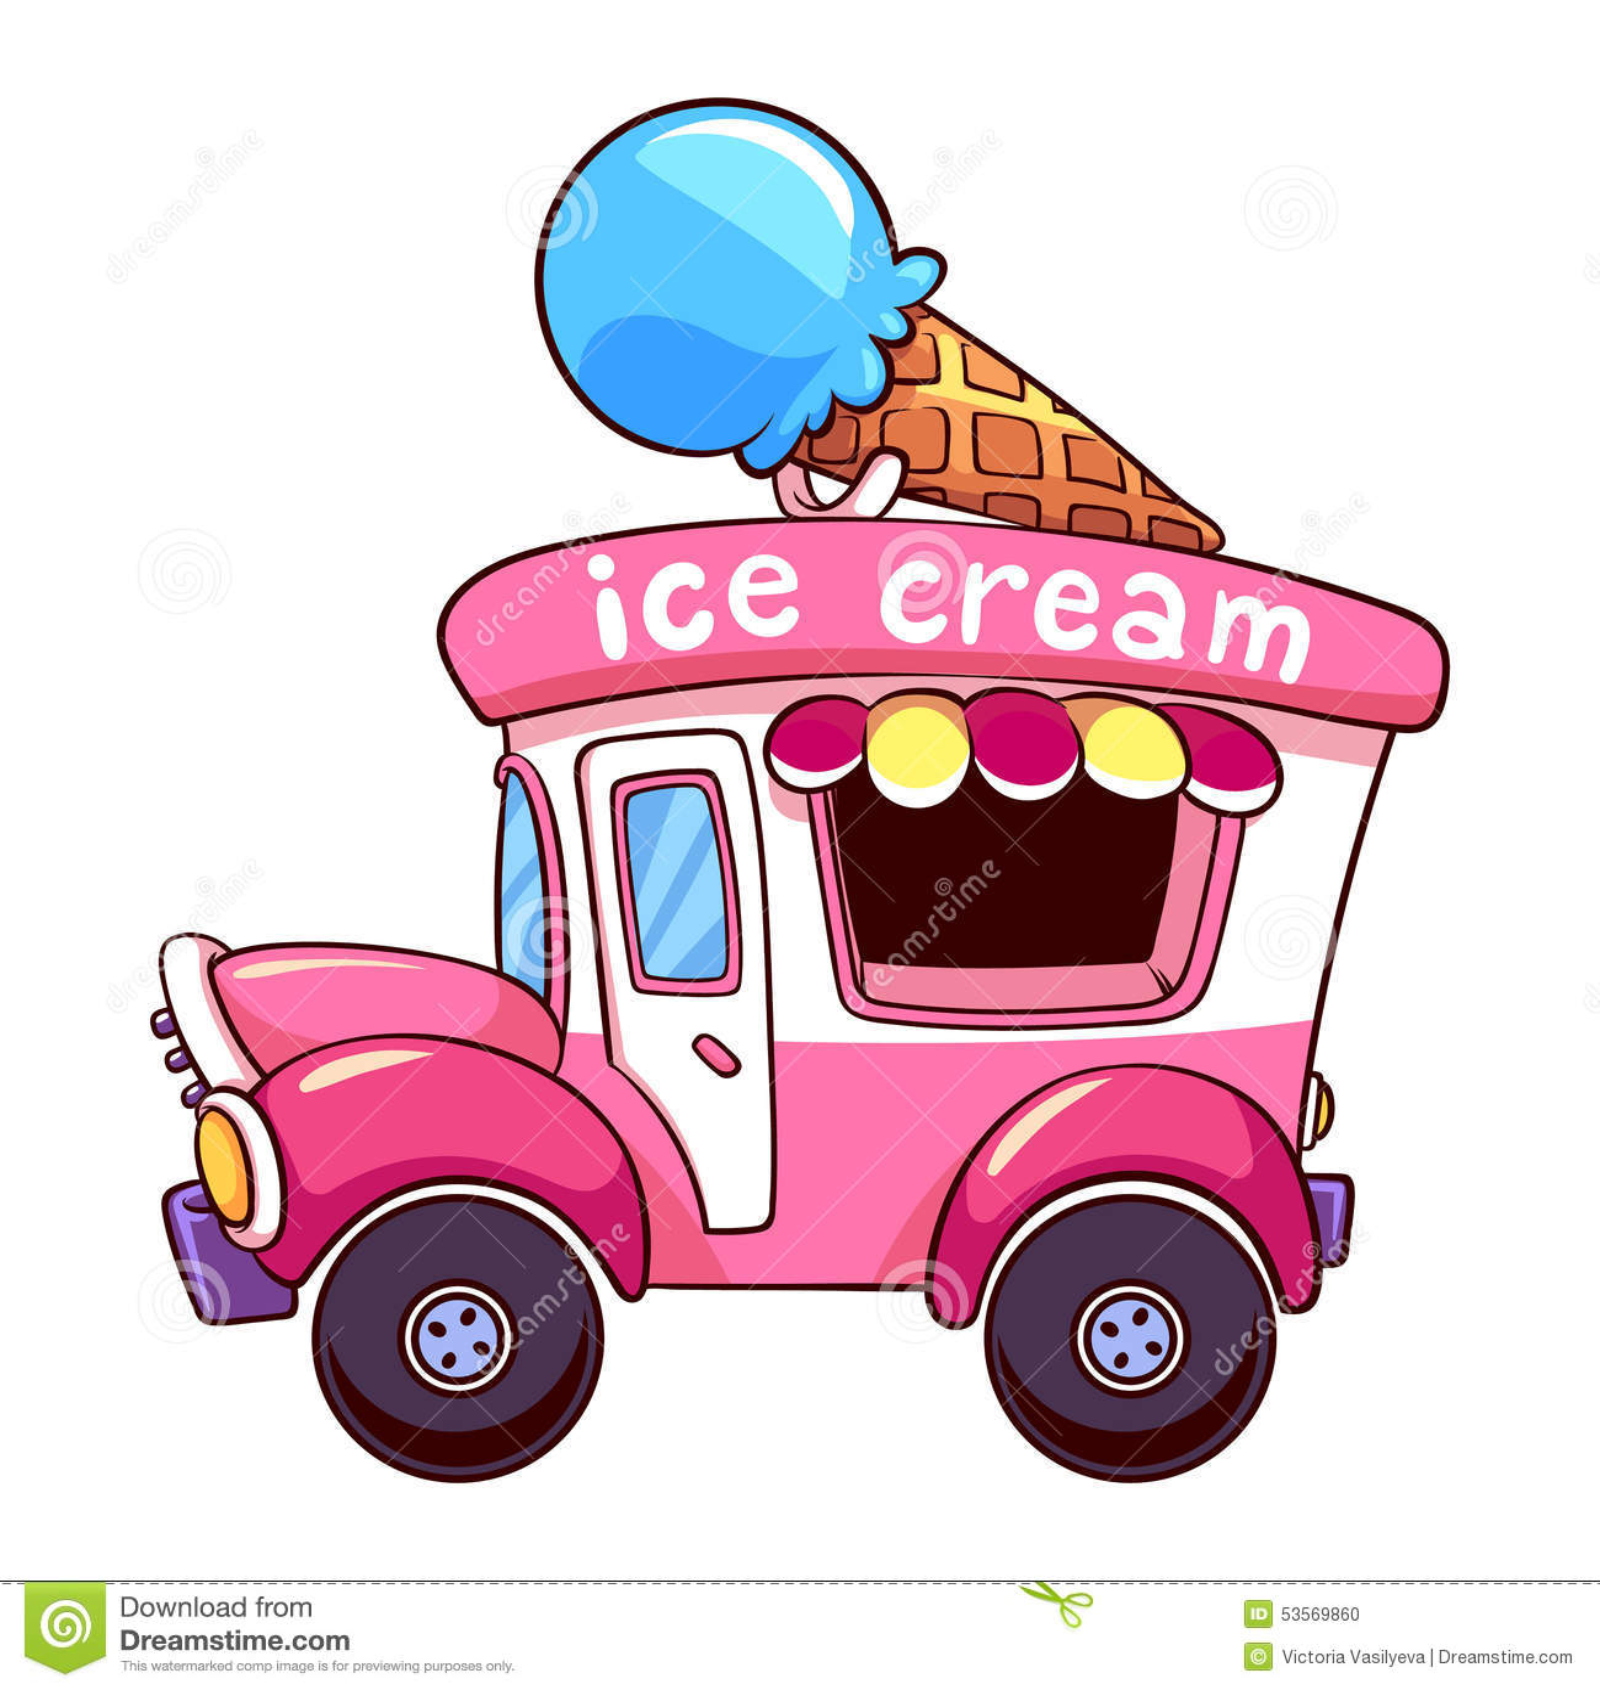 3d Snow Falling Wallpaper Cartoon Pink Ice Cream Truck On а White Background Stock